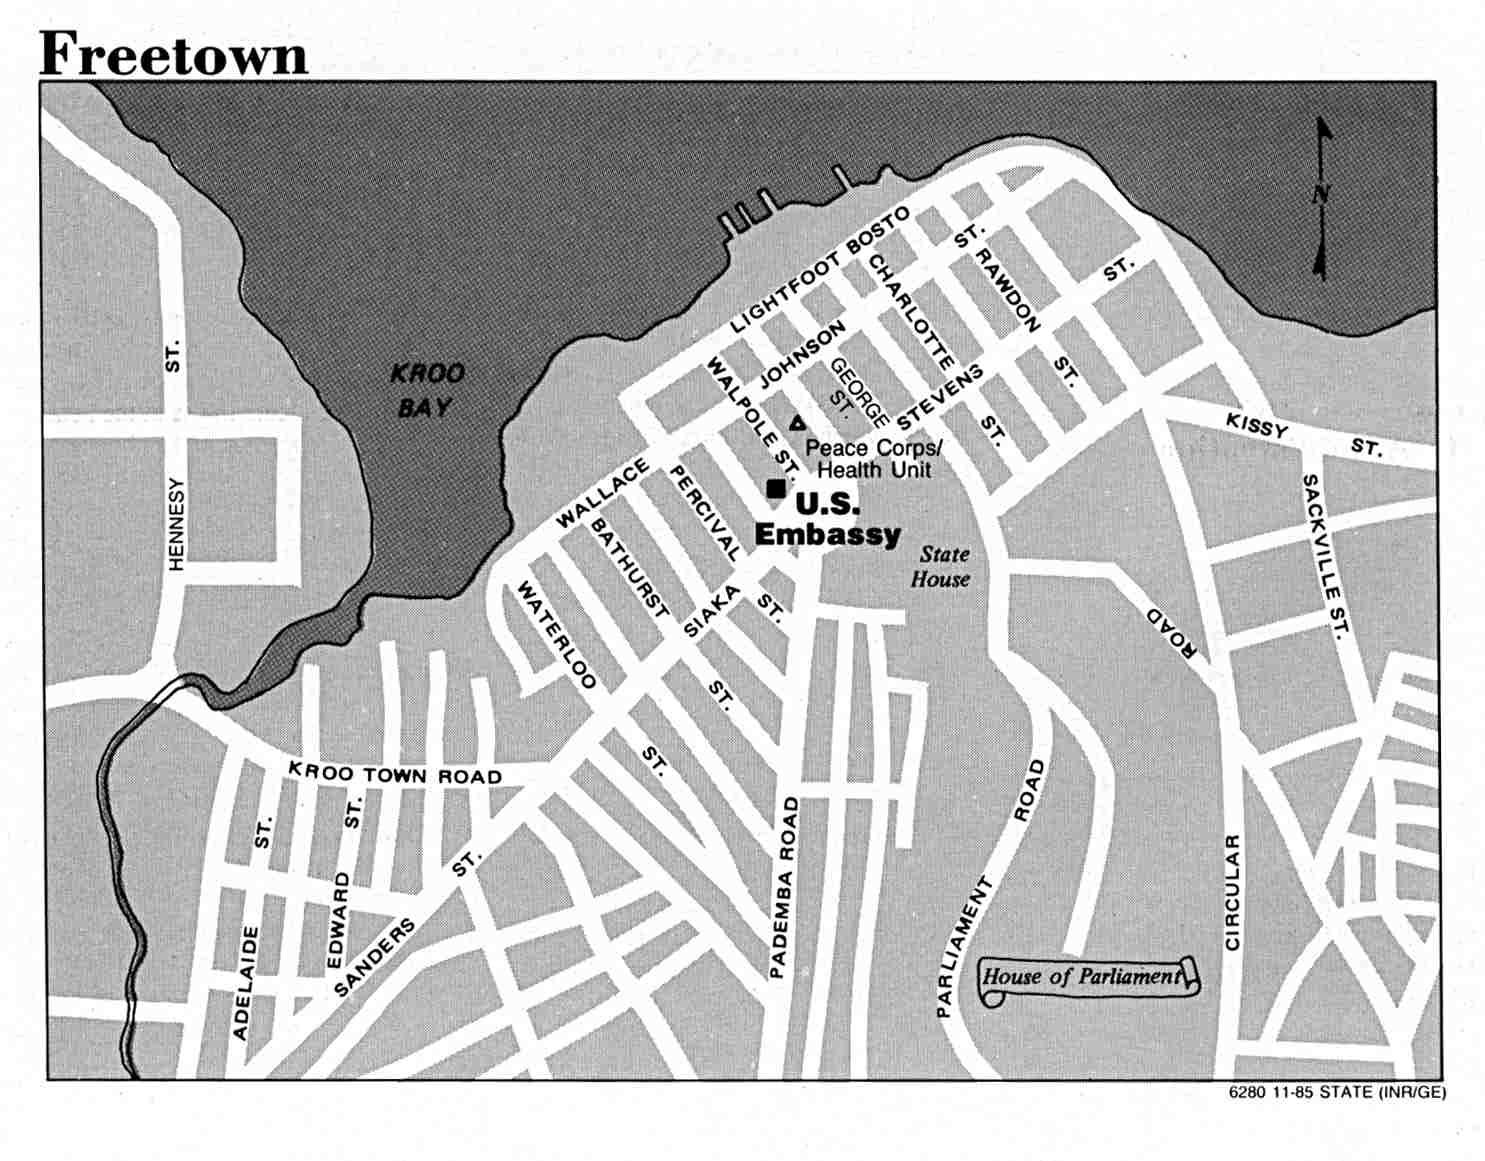 Freetown City Map, Sierra Leone